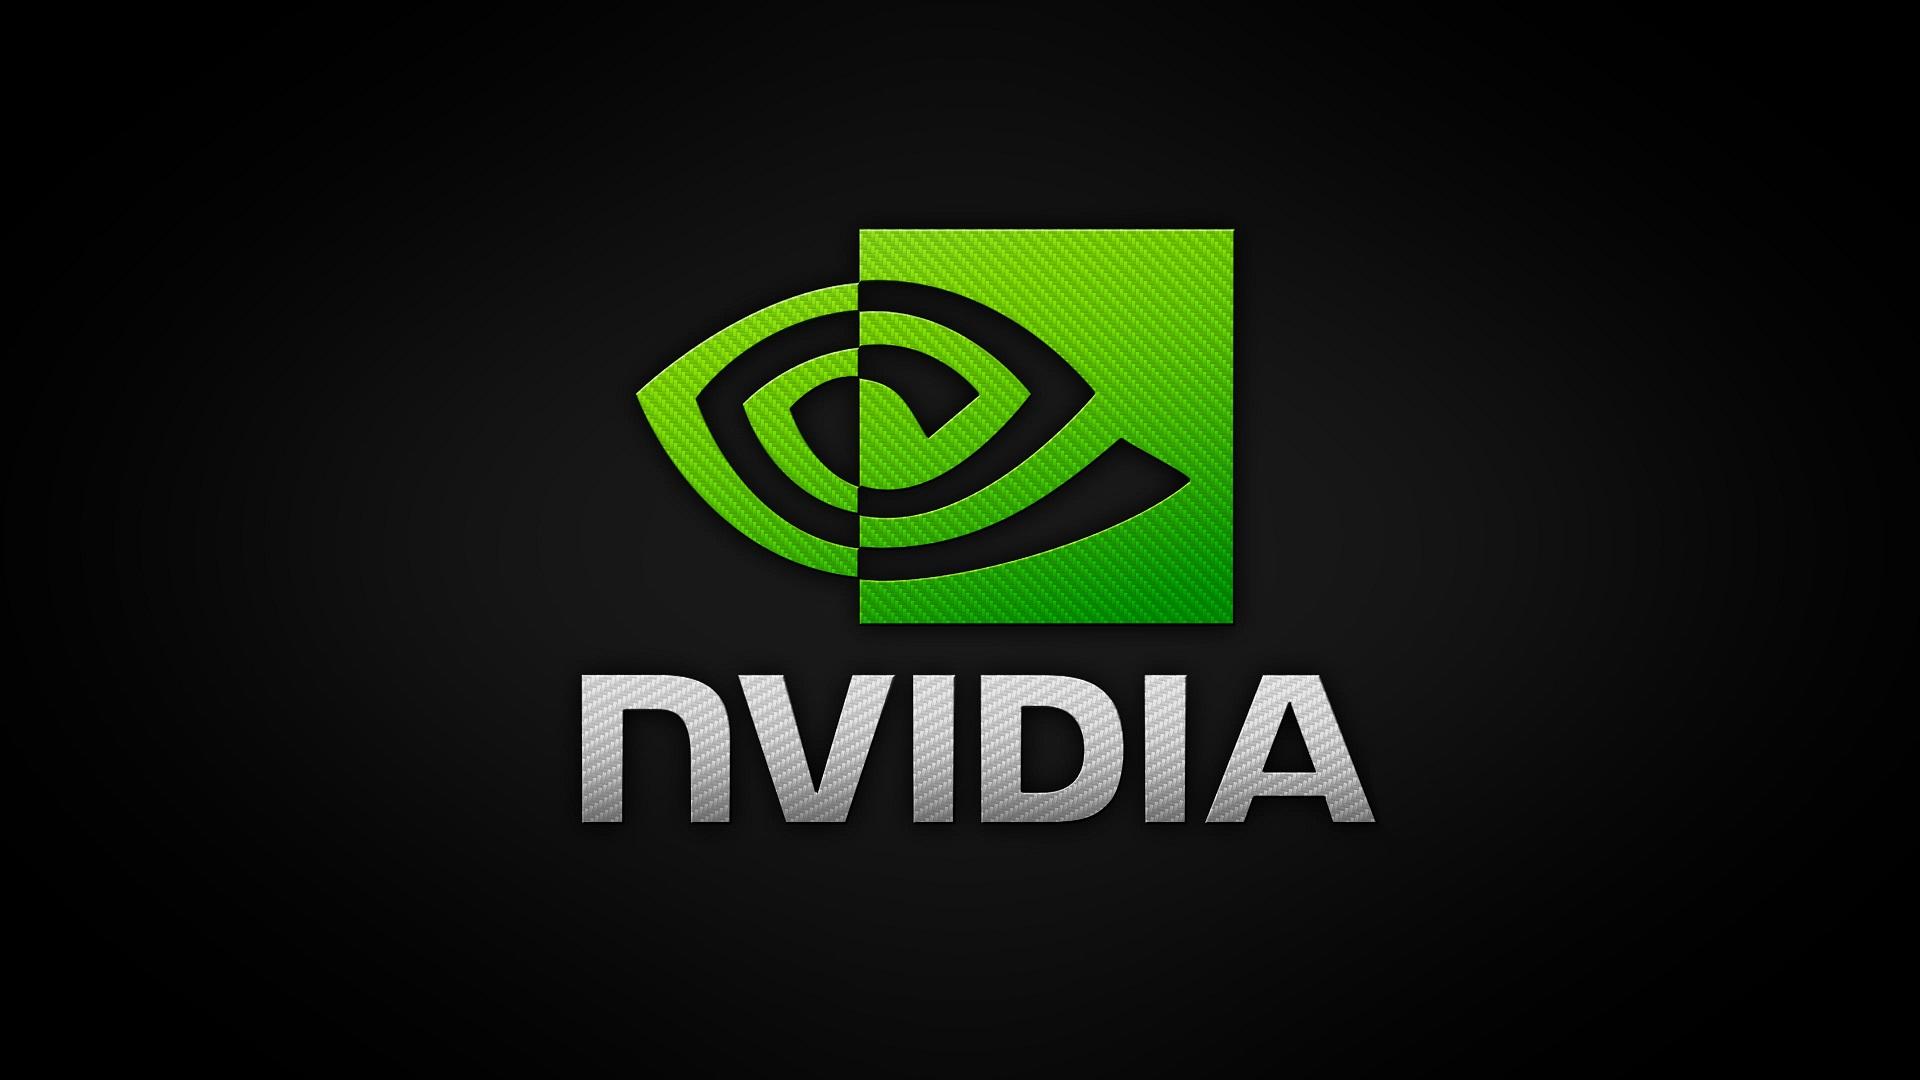 nvidia logo wallpaper - خاتمه دادن انویدیا به پشتیبانی از کارتهای گرافیکهای GeForce GTX 700/600